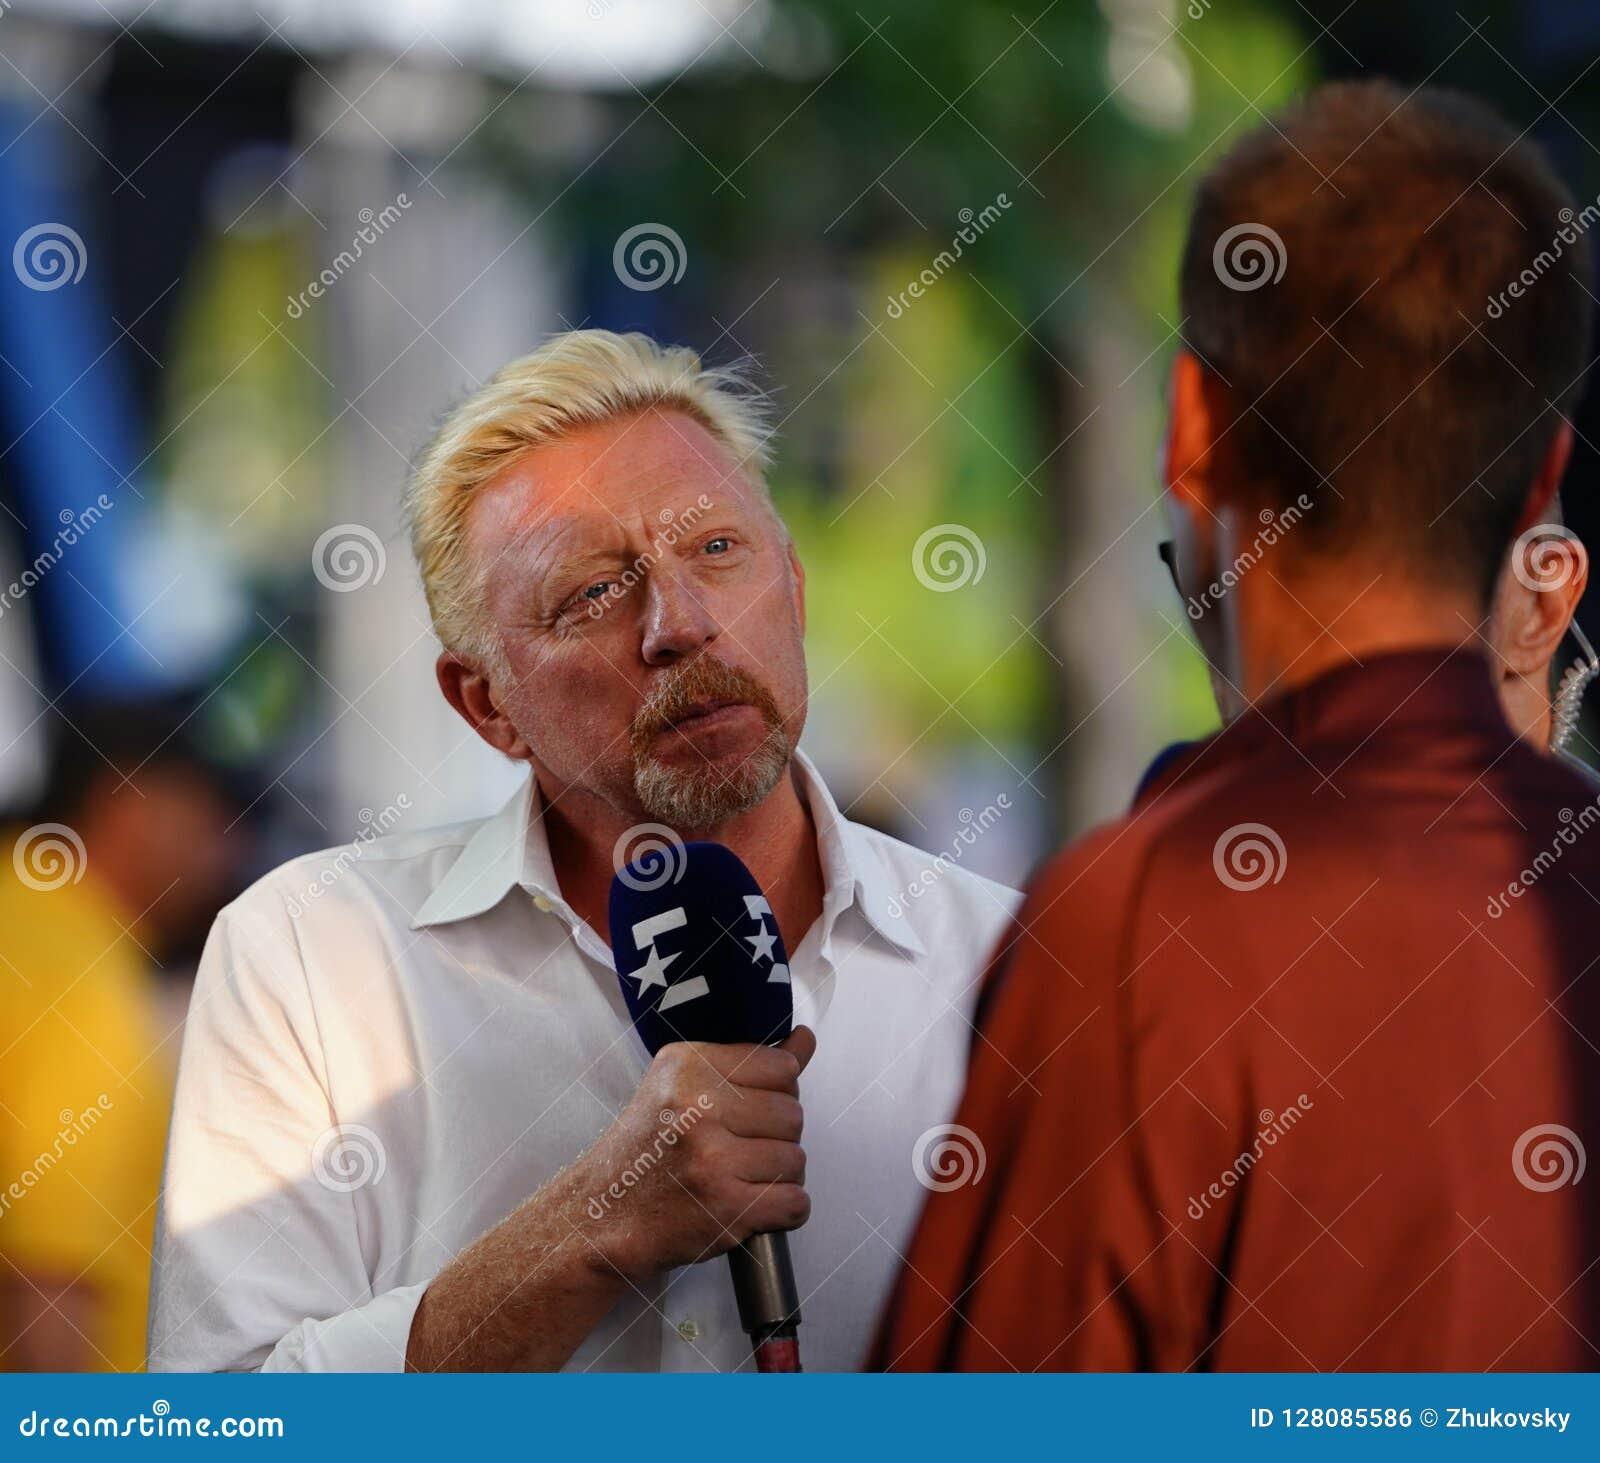 Eurosport analyst Grand Slam Champion Boris Becker conducts interview during 2018 US Open